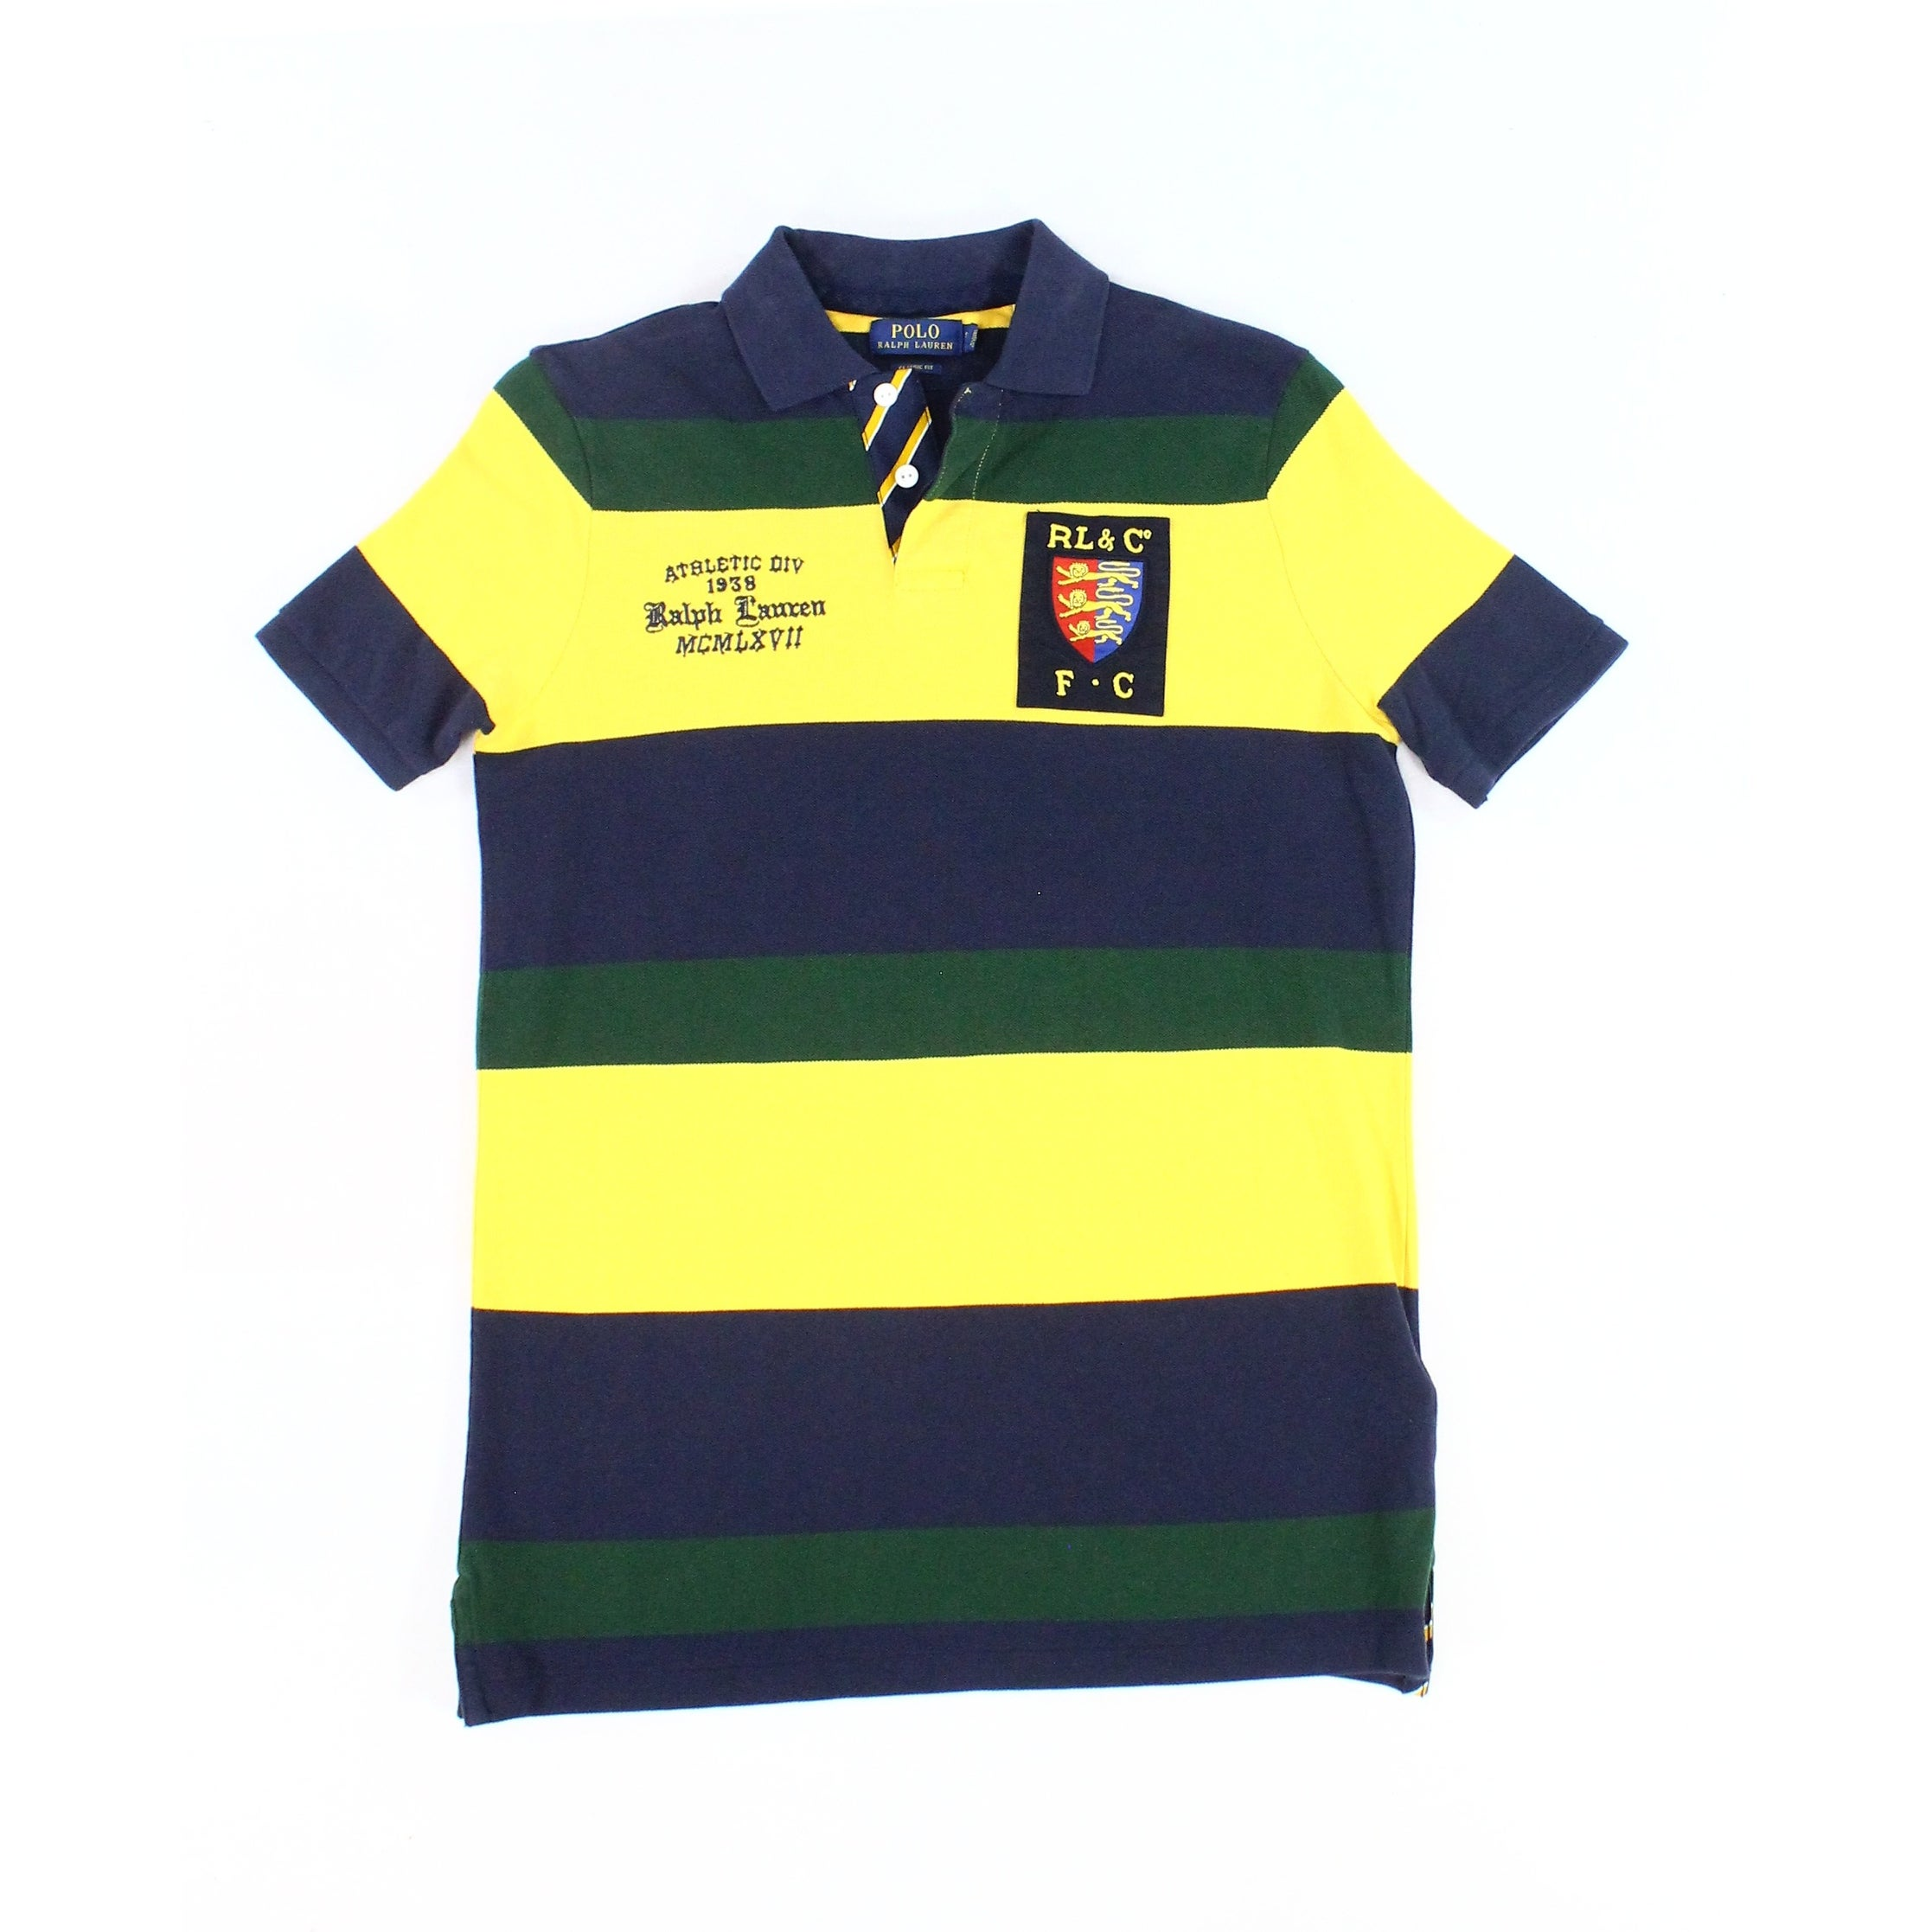 7205c1aa0 Polo Ralph Lauren Shirts